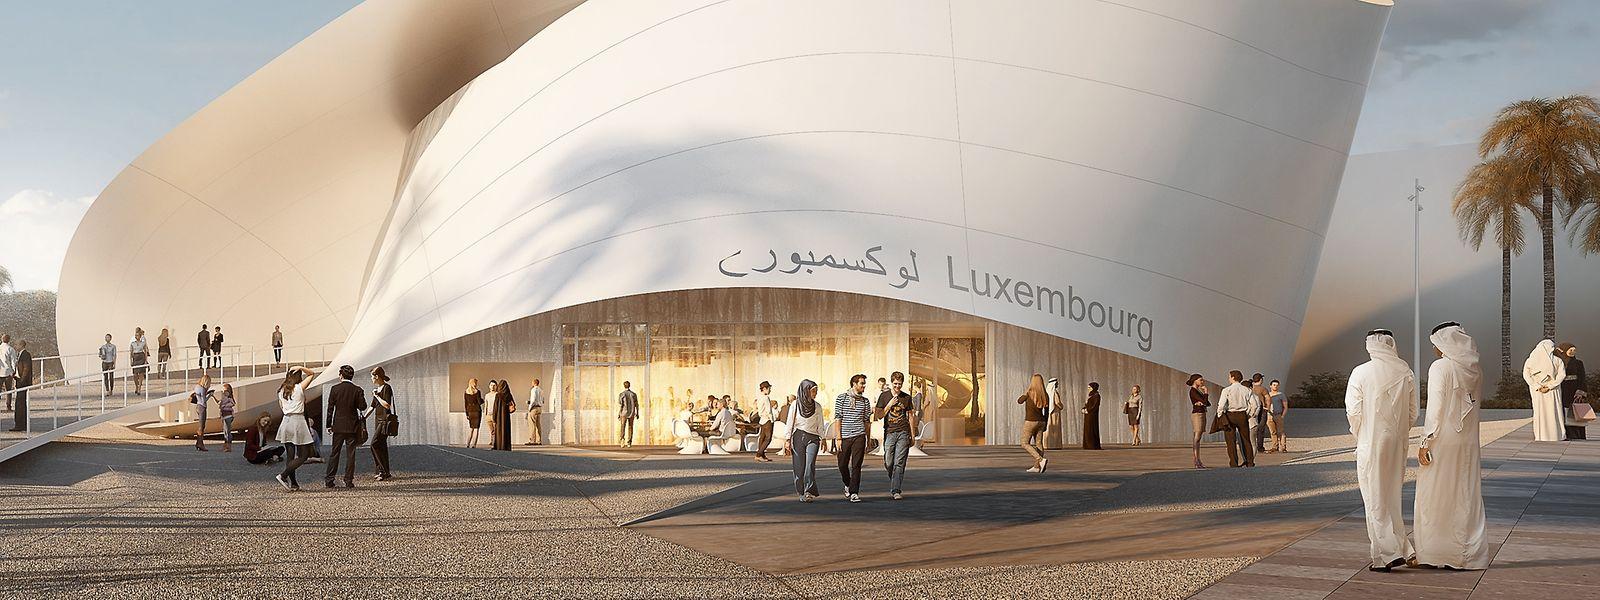 Der luxemburgische Pavillon der Dubai EXPO 2020.